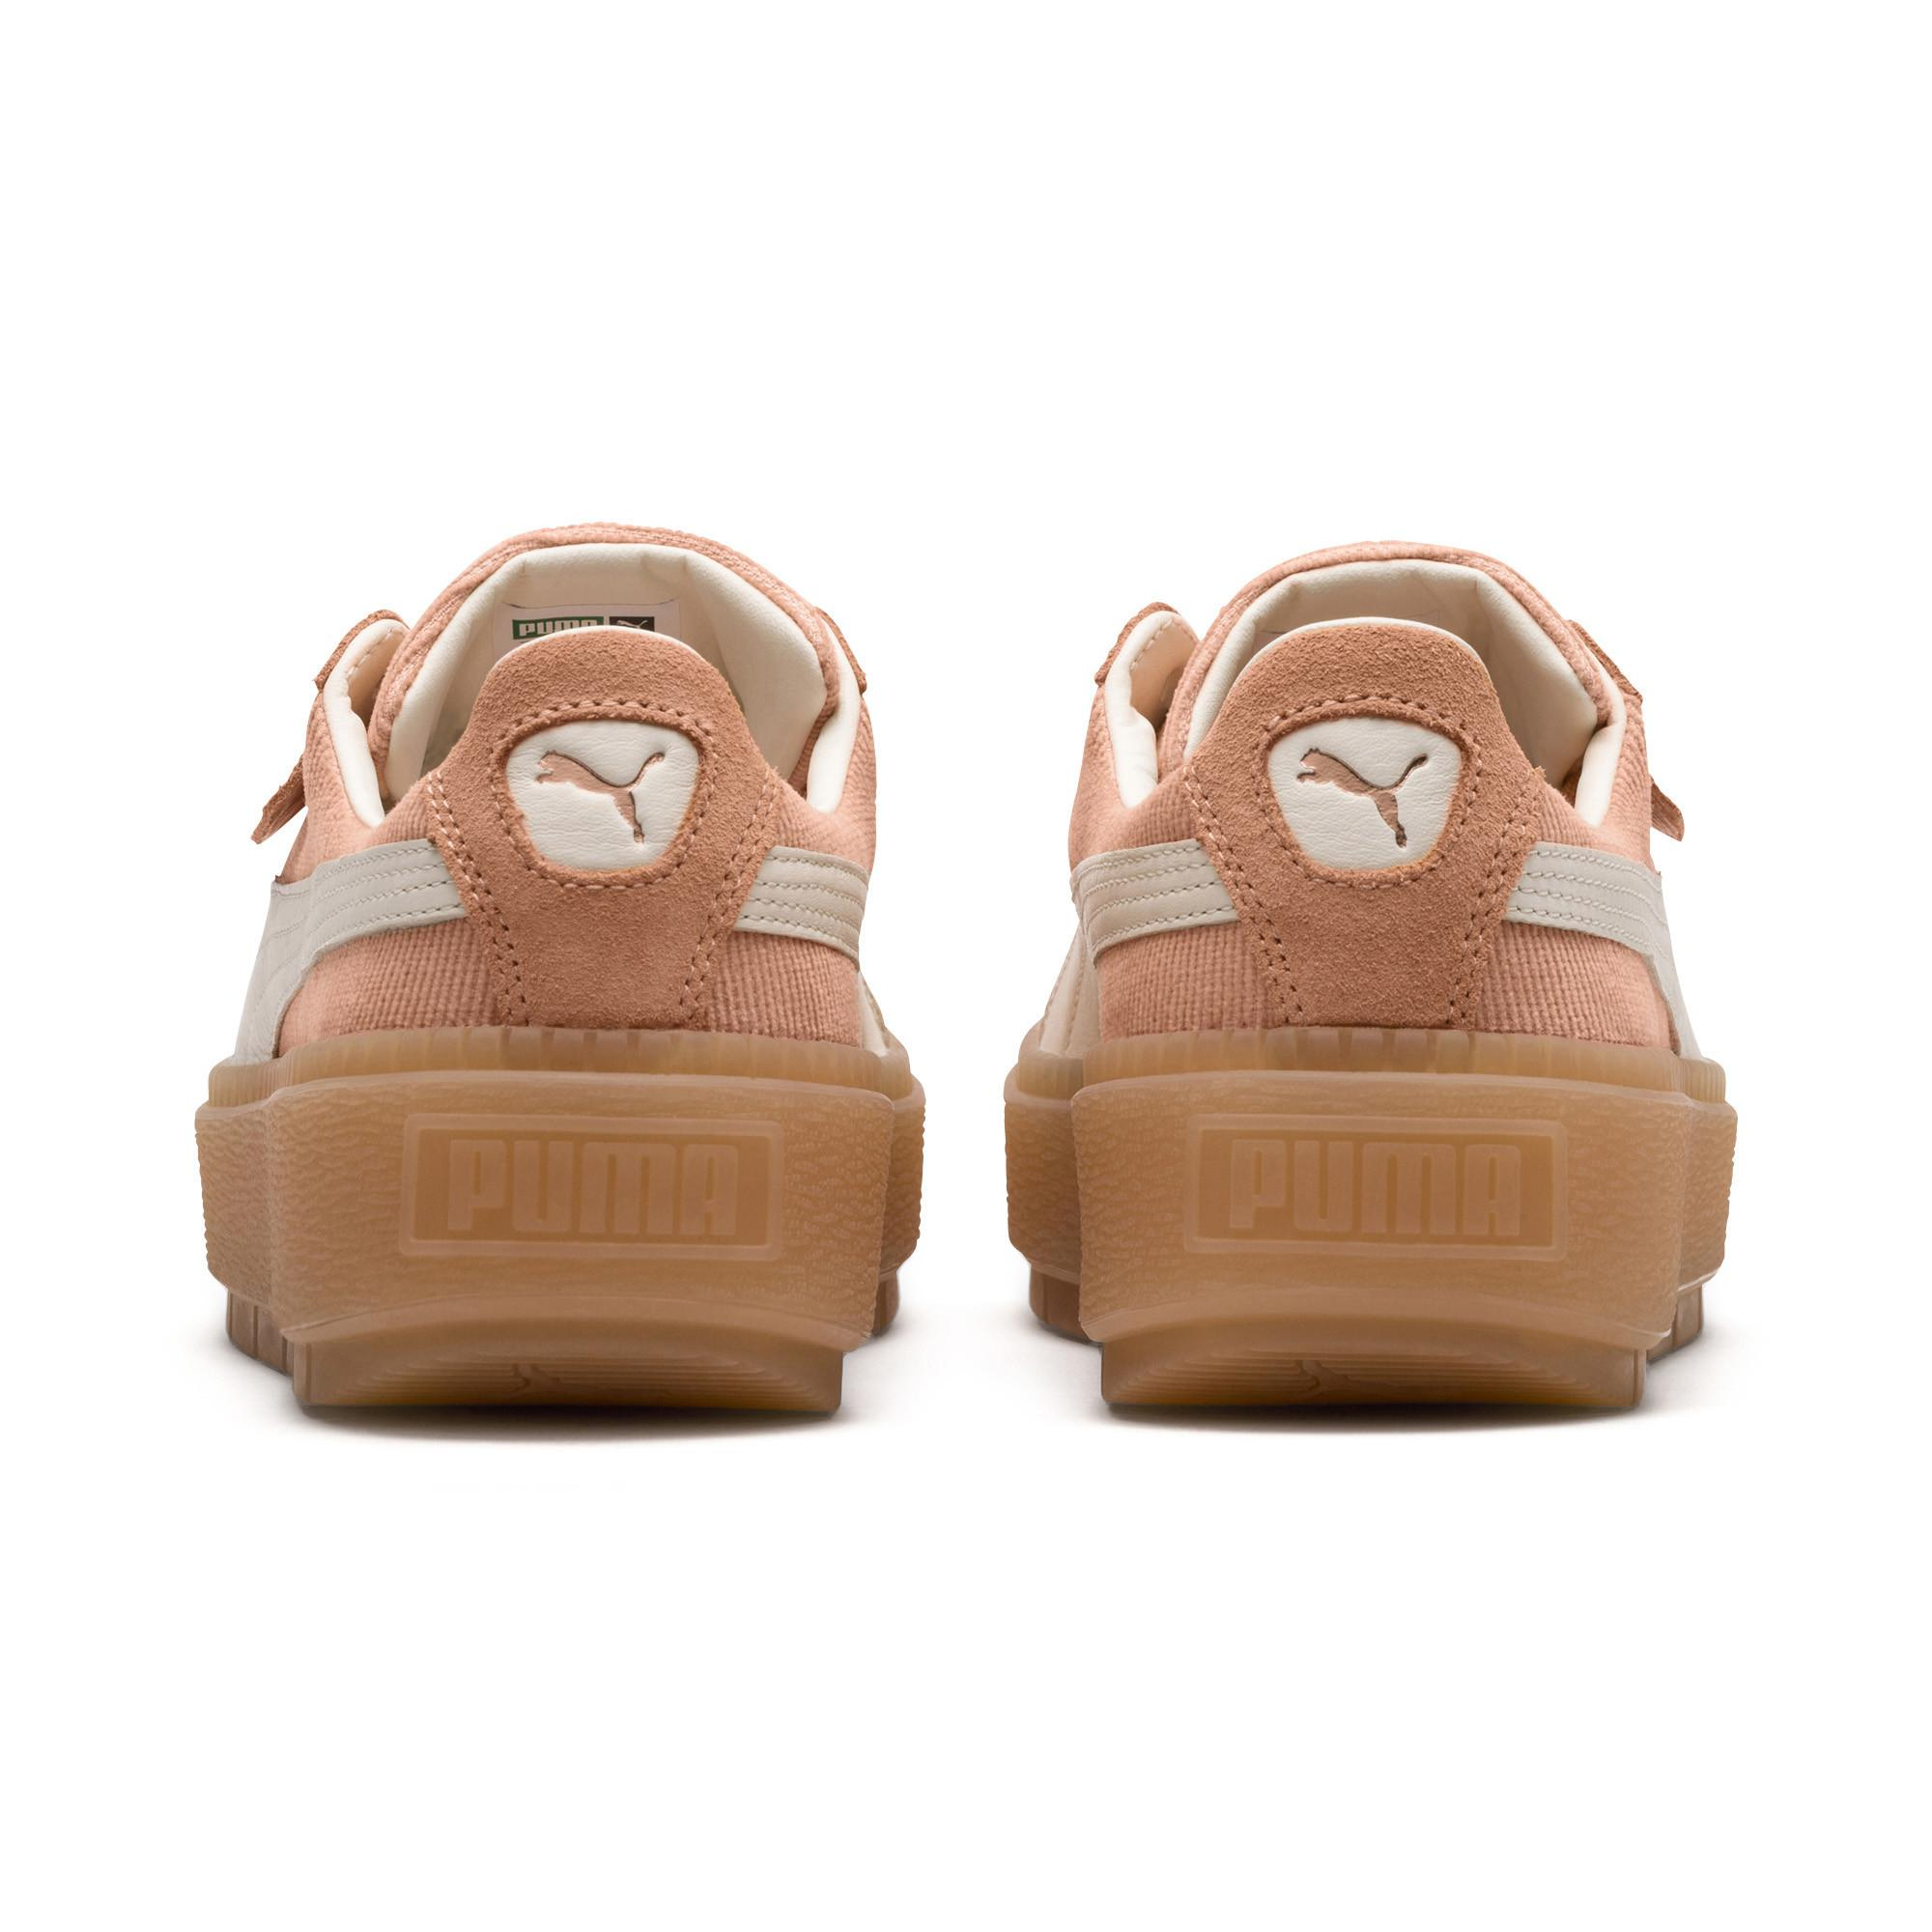 67b8121c11be PUMA - Multicolor Platform Trace Corduroy Women s Sneakers - Lyst. View  fullscreen